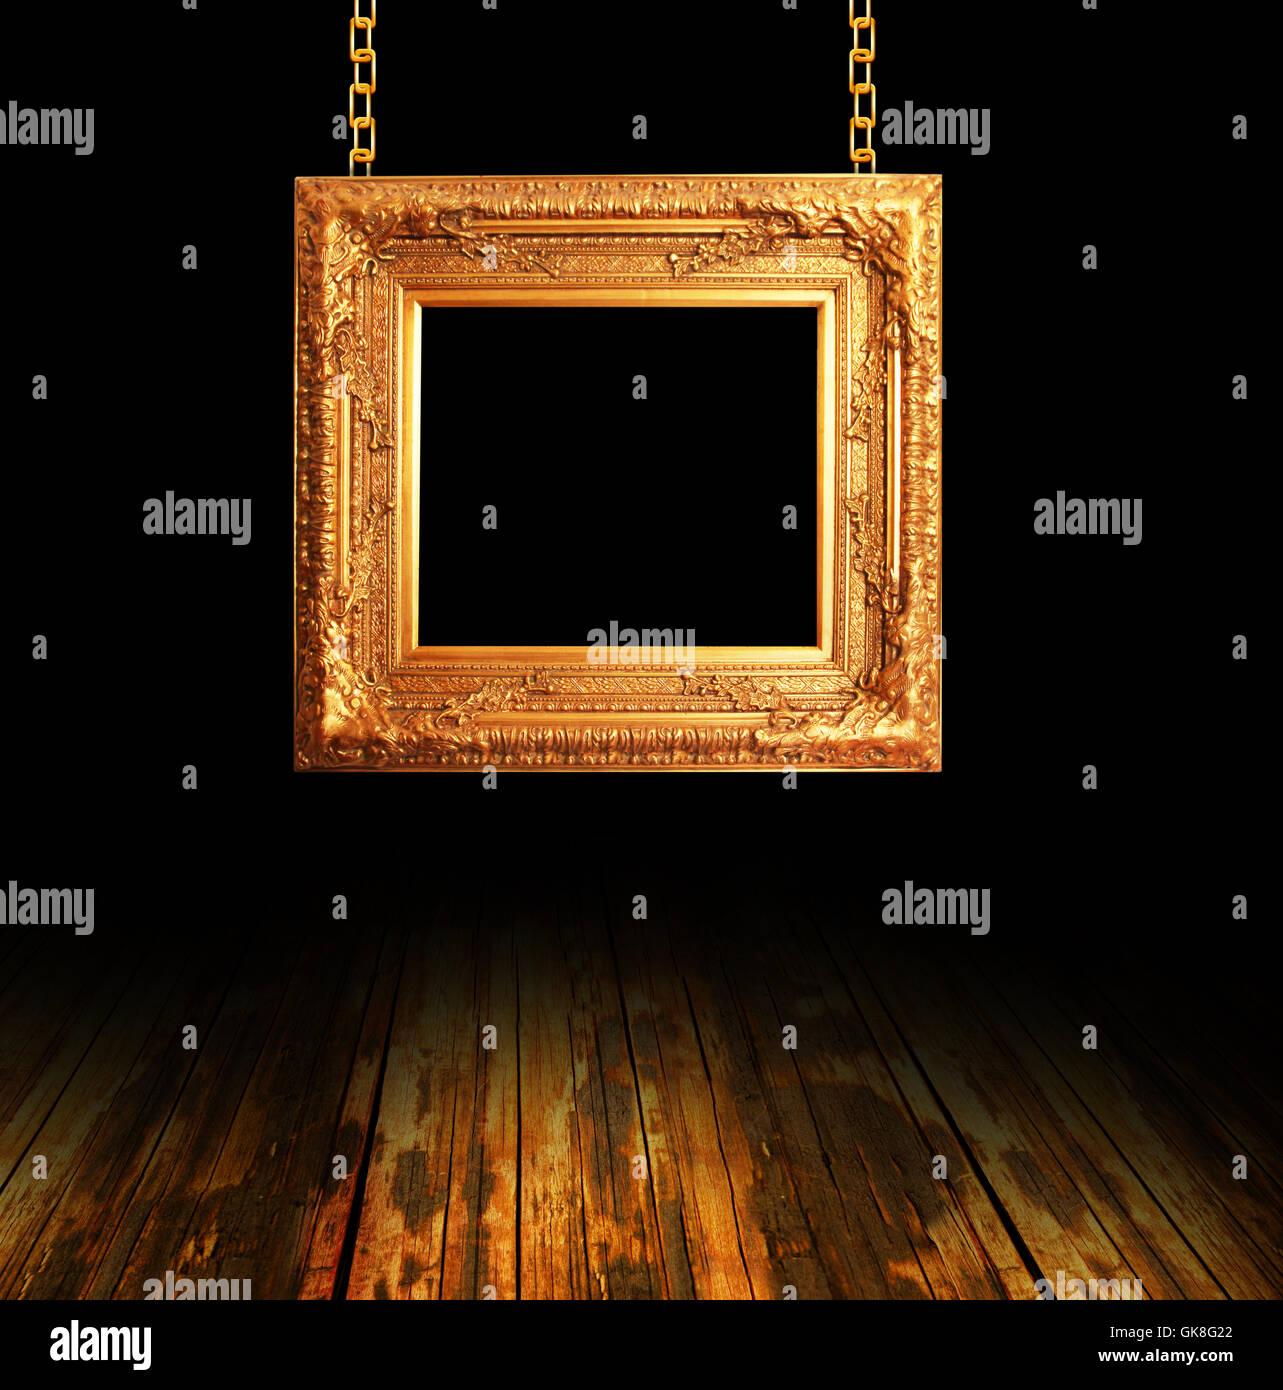 Picture Frame Border Framing Stockfotos & Picture Frame Border ...